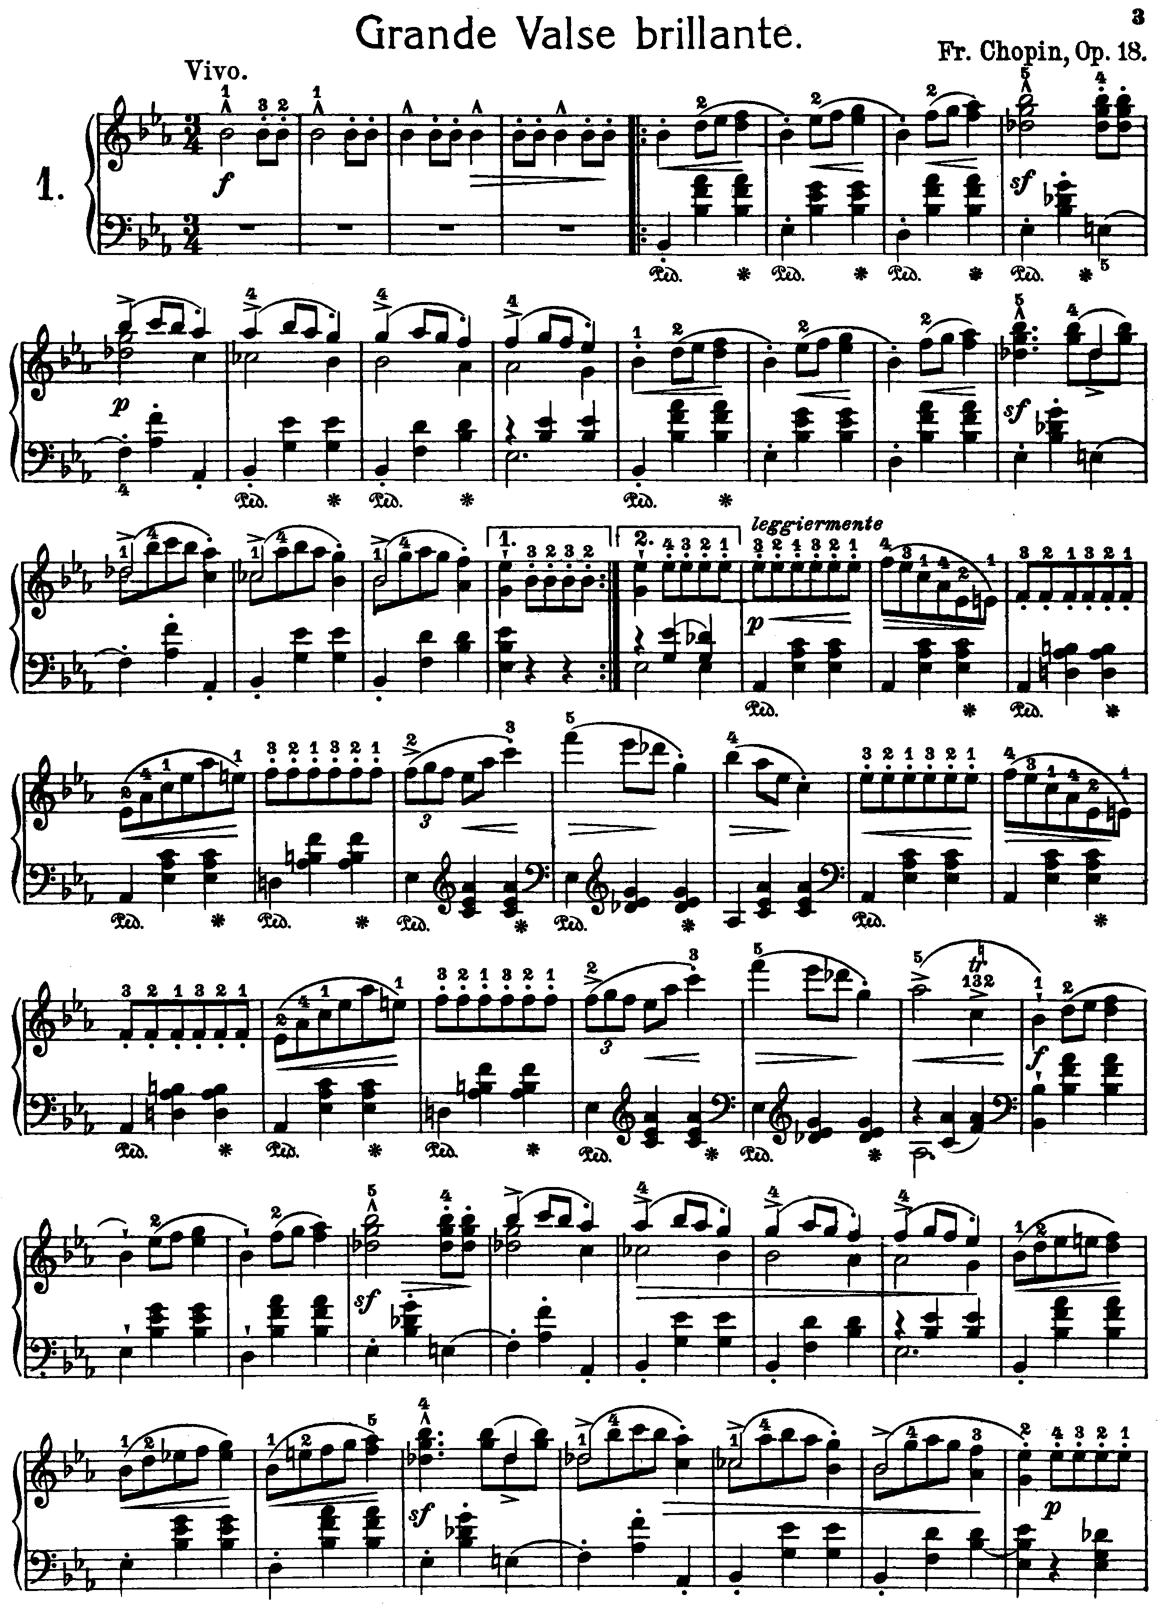 Frederic Chopin Grand Waltz Op.18 Free Printable Sheet Music | Music - Free Printable Sheet Music